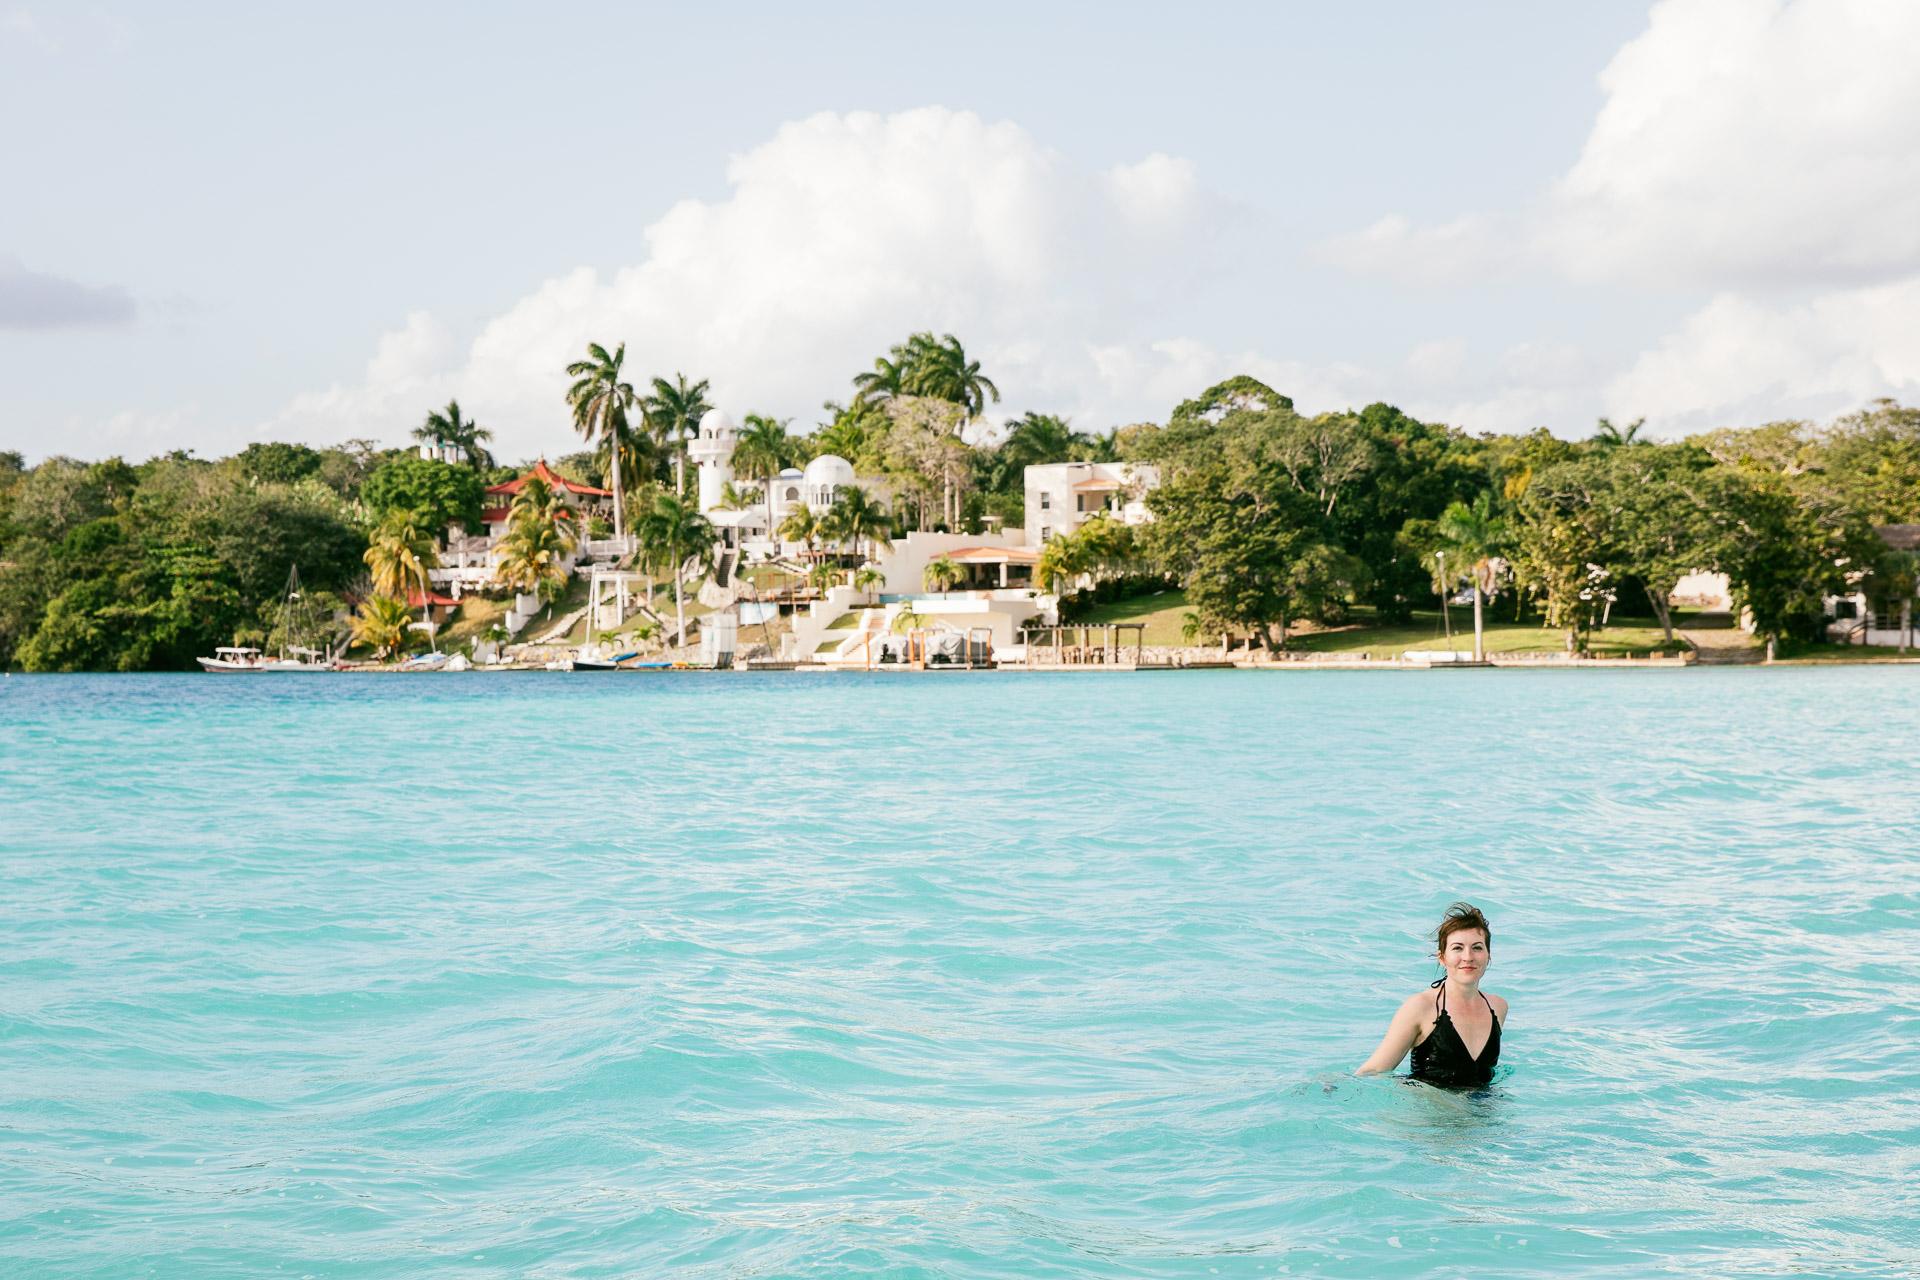 mexico-luxury-hotel-photographer-riviera-maya-mia-bacalar-22.jpg